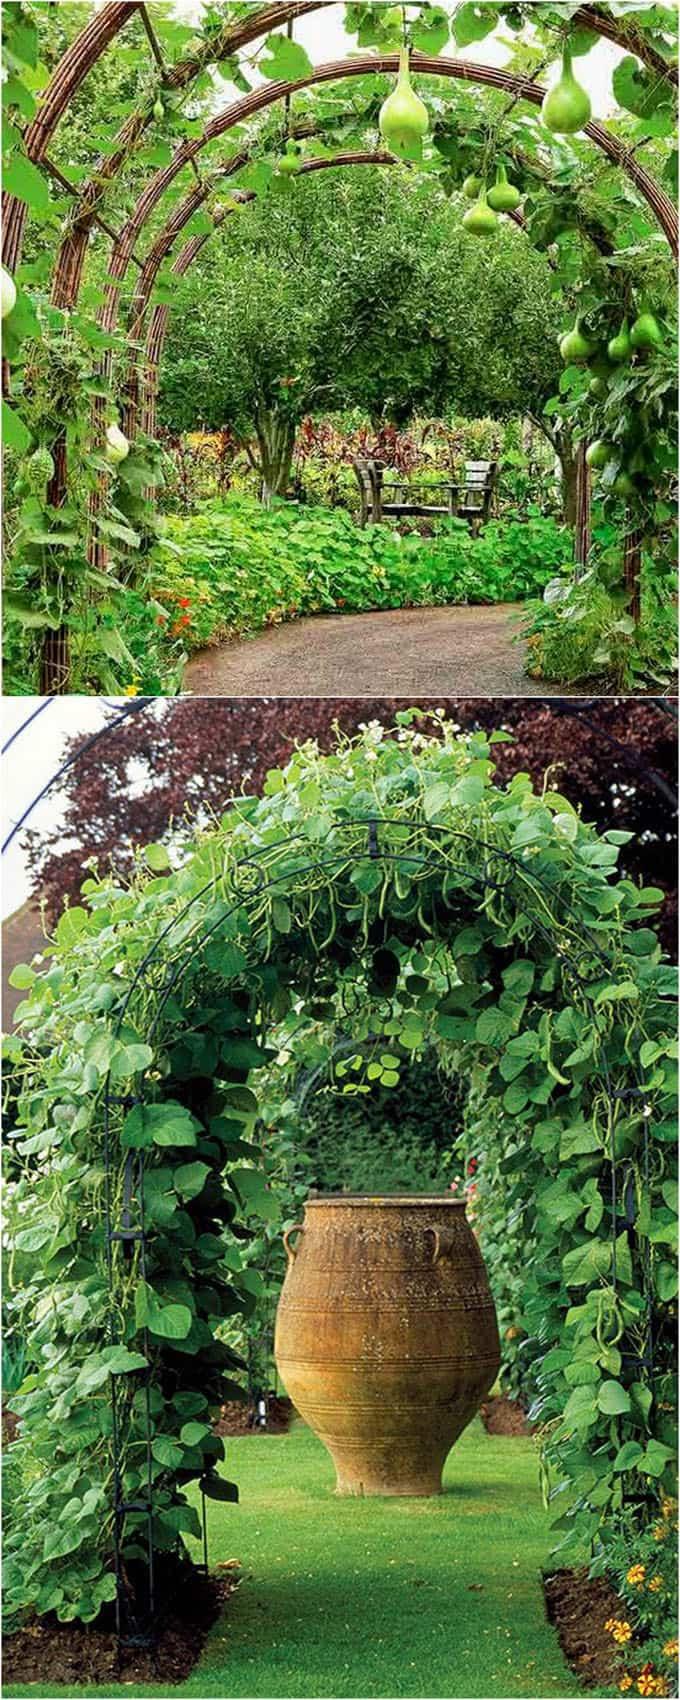 Simphome.com easy diy garden trellis ideas vertical growing structures a intended for 2020 2021 2022